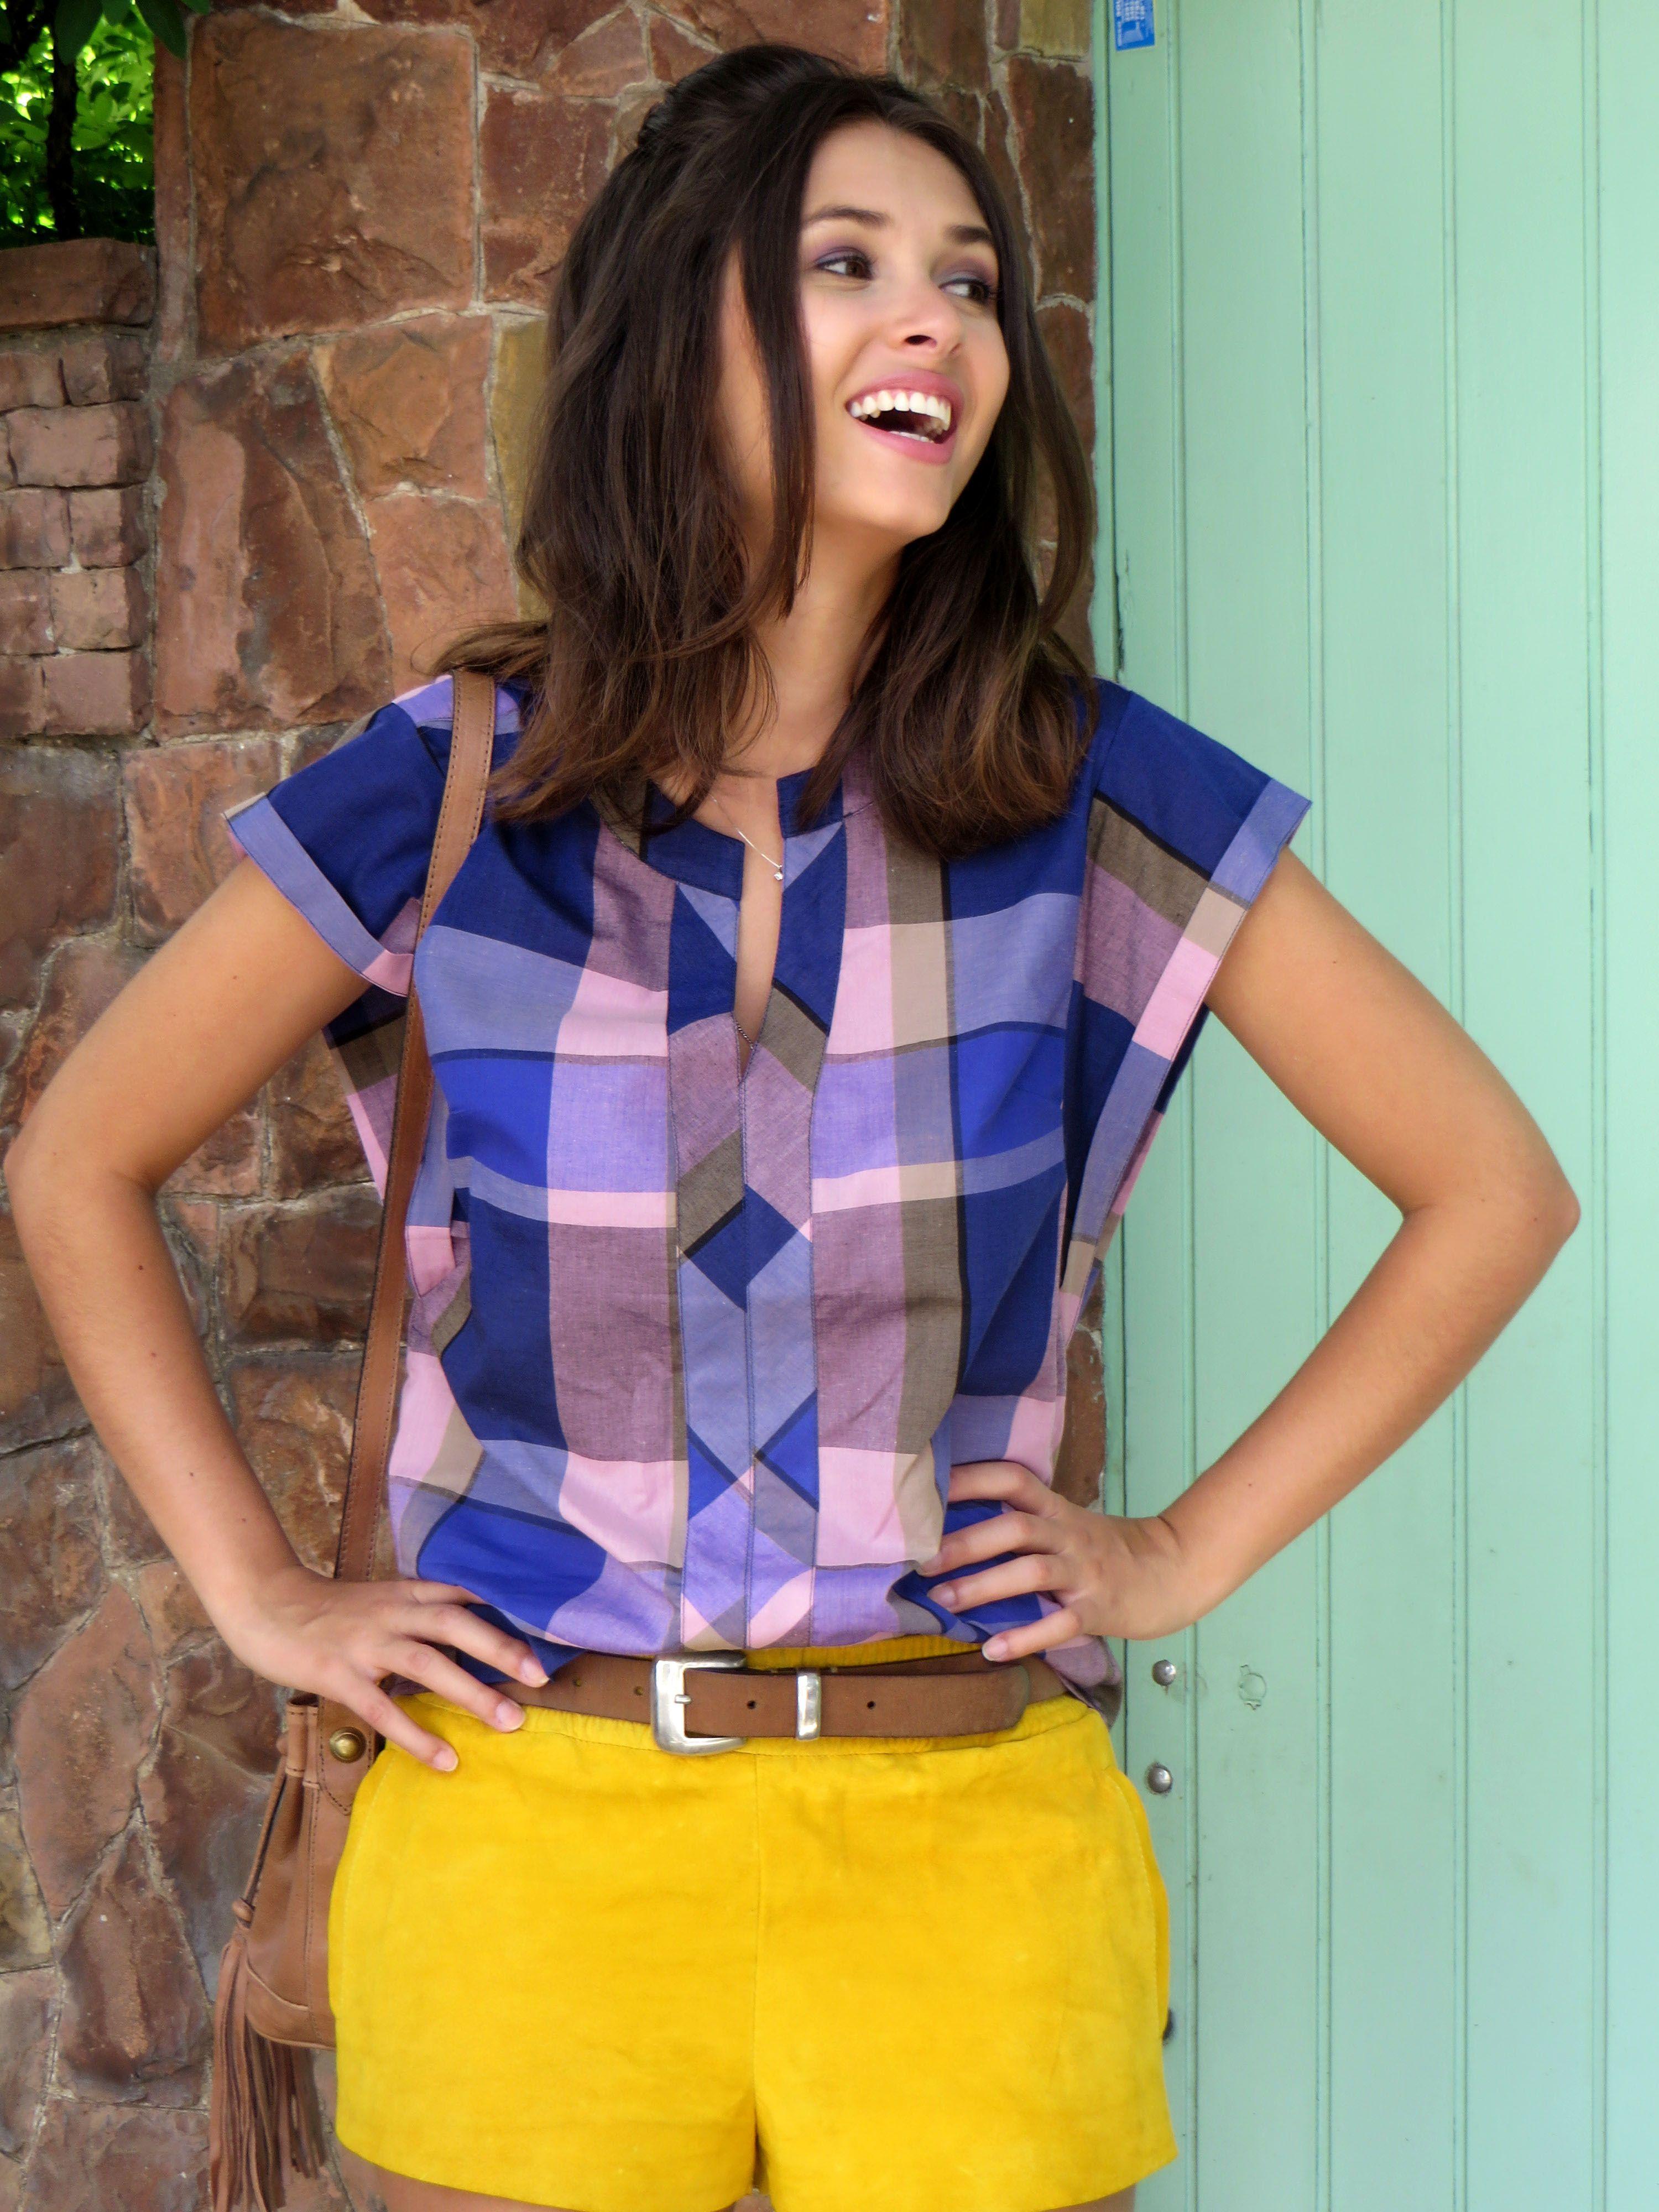 e4ff98aa0fb0 Blouse plaid in shades of purple with yellow shorts - Blusa xadrez em tons  de roxo usado com um shorts amarelo